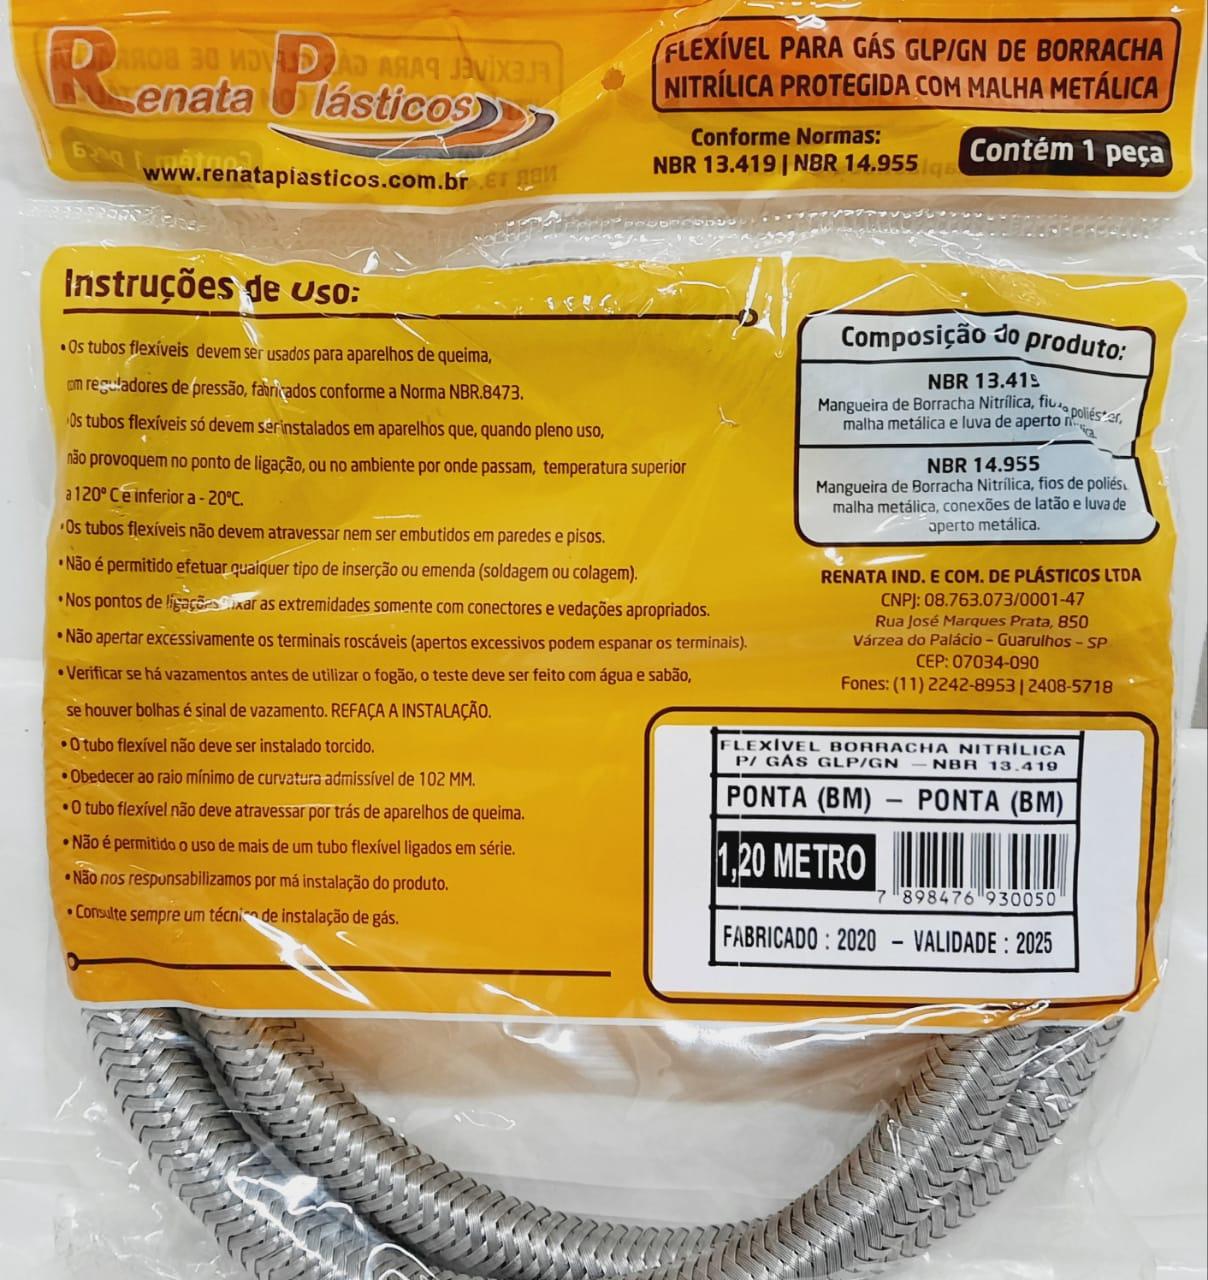 Flexível Nitrílico P X P 1,20MT REN